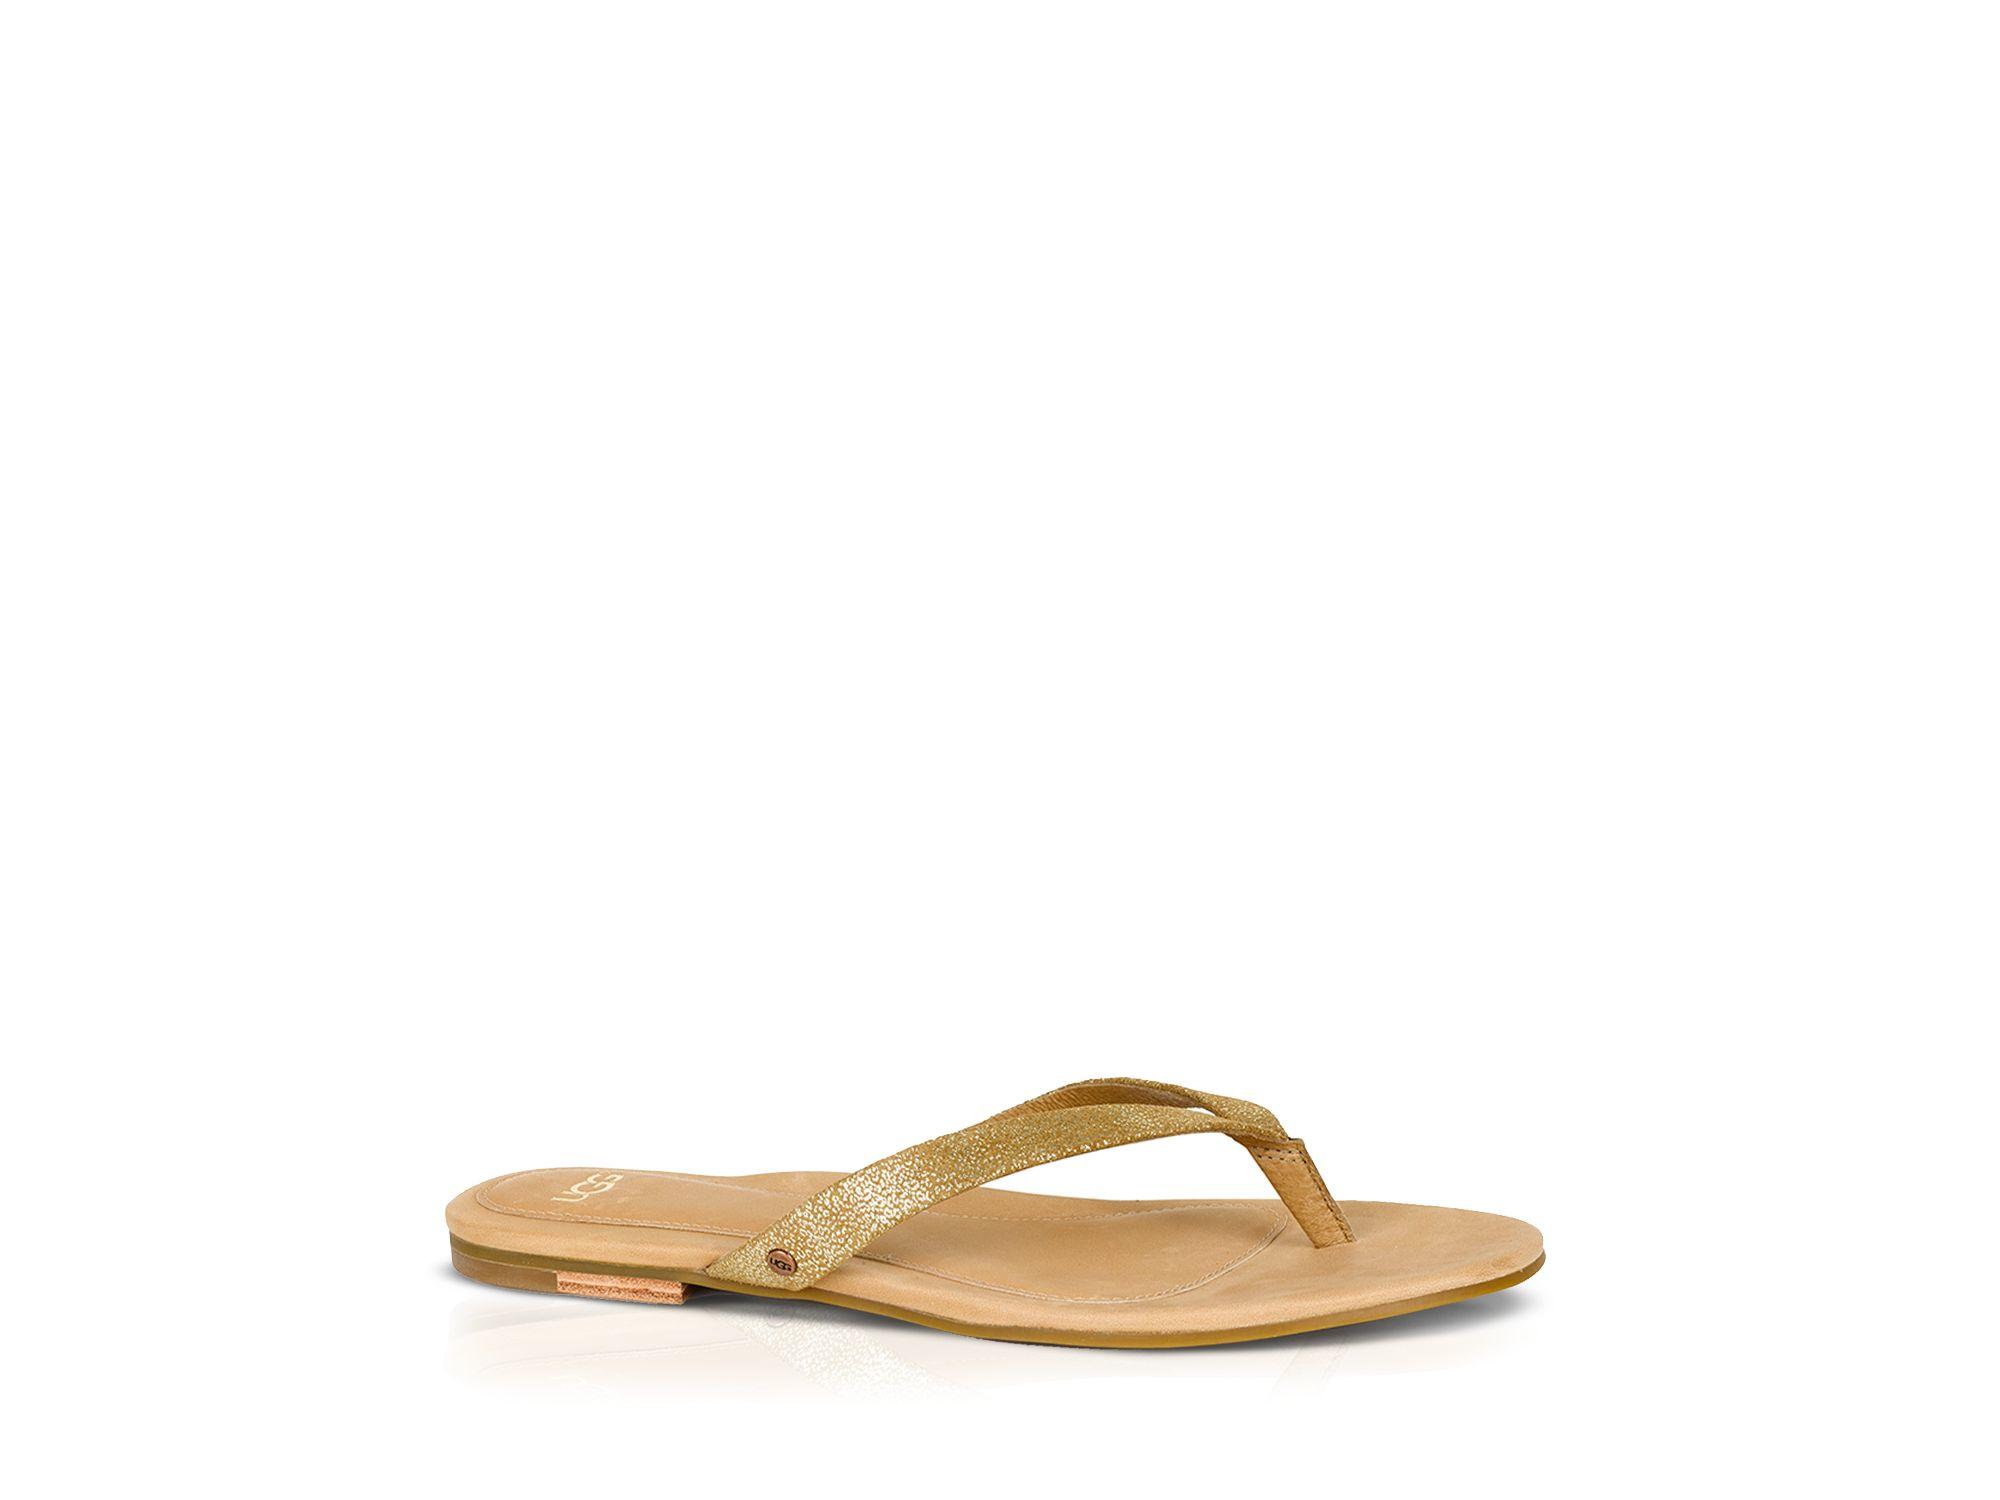 942961e03d712c Lyst - UGG Ugg® Australia Flat Thong Sandals - Allaria Ii Metallic ...